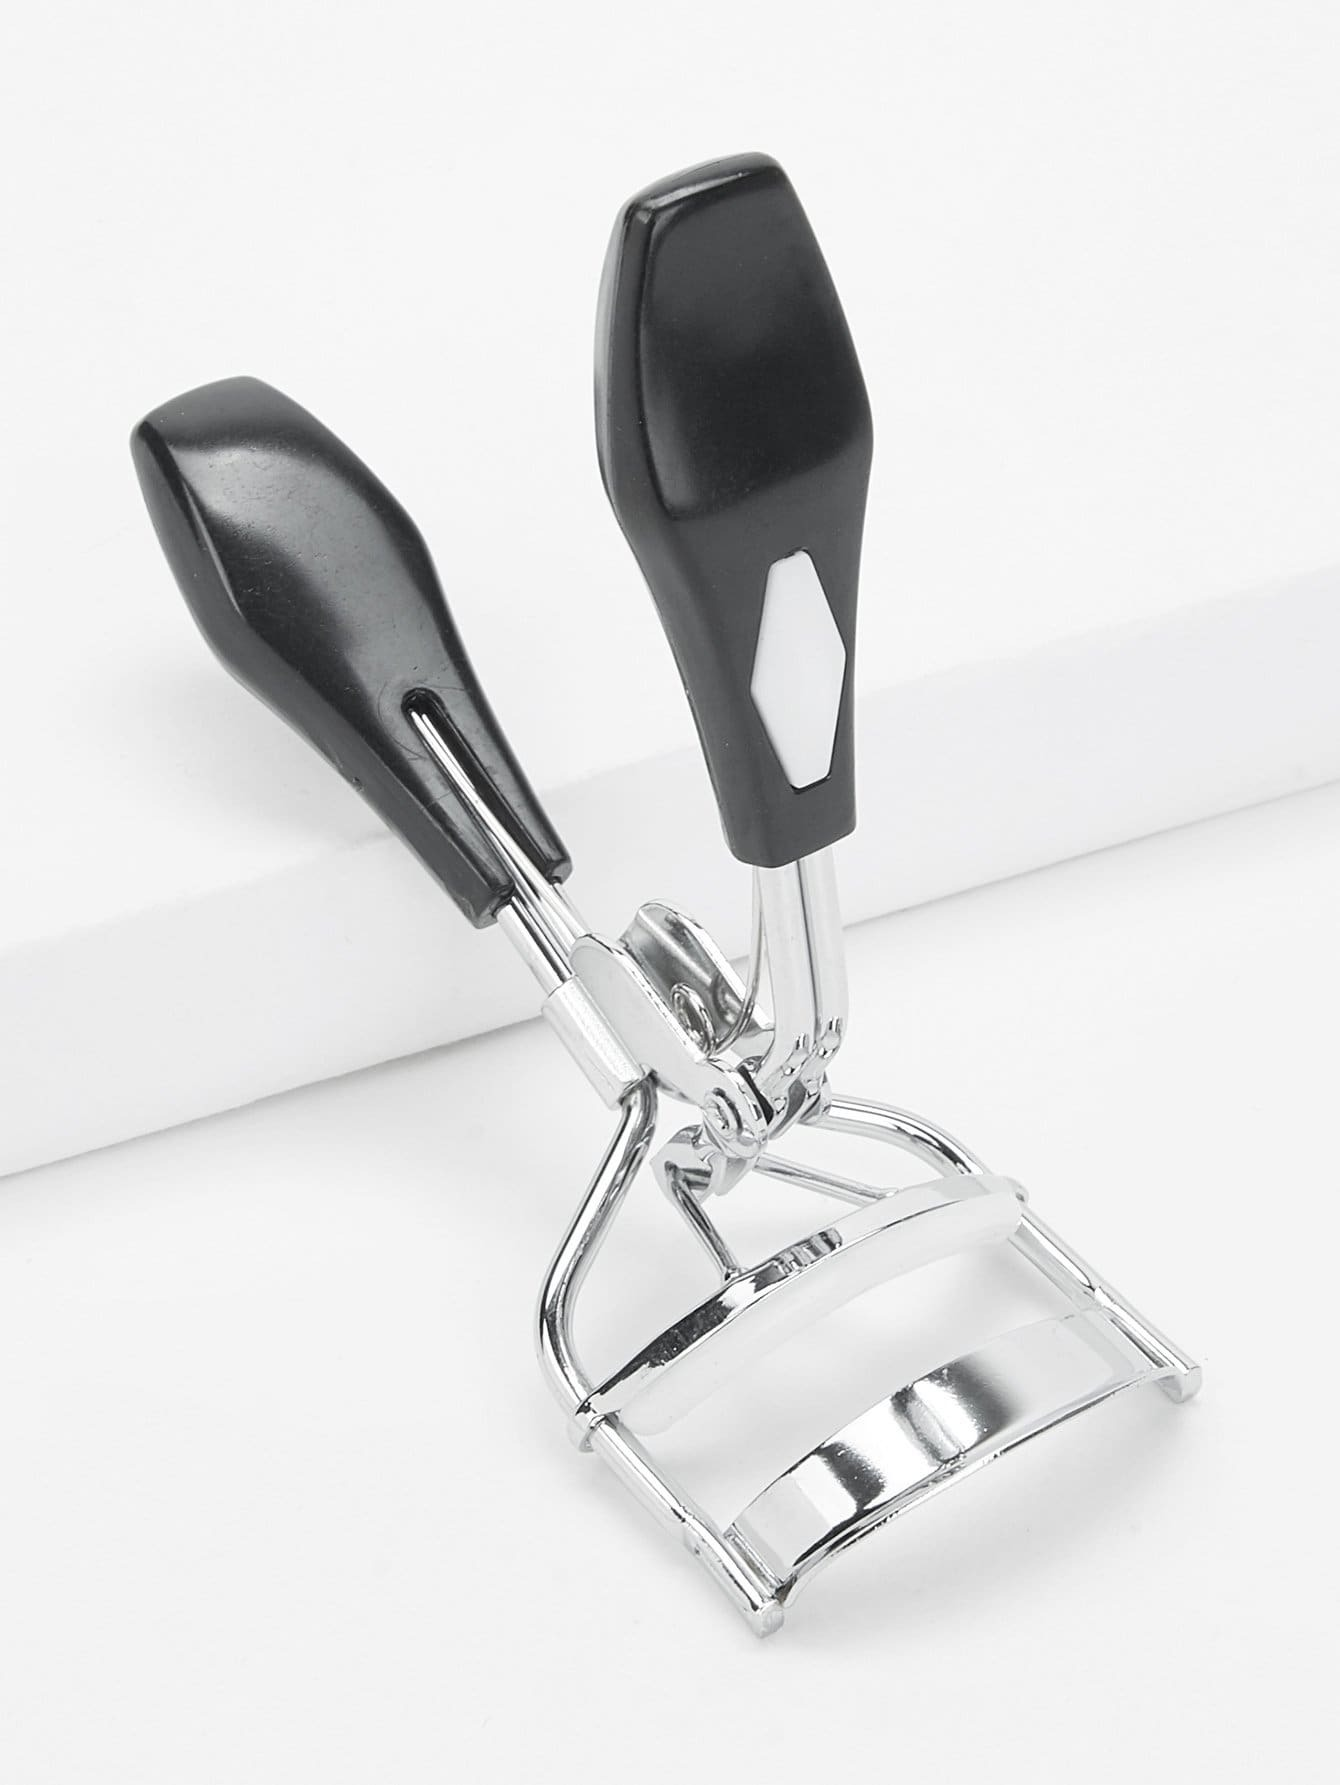 Stainless Steel Eyelash Clip stainless steel eyelash clip